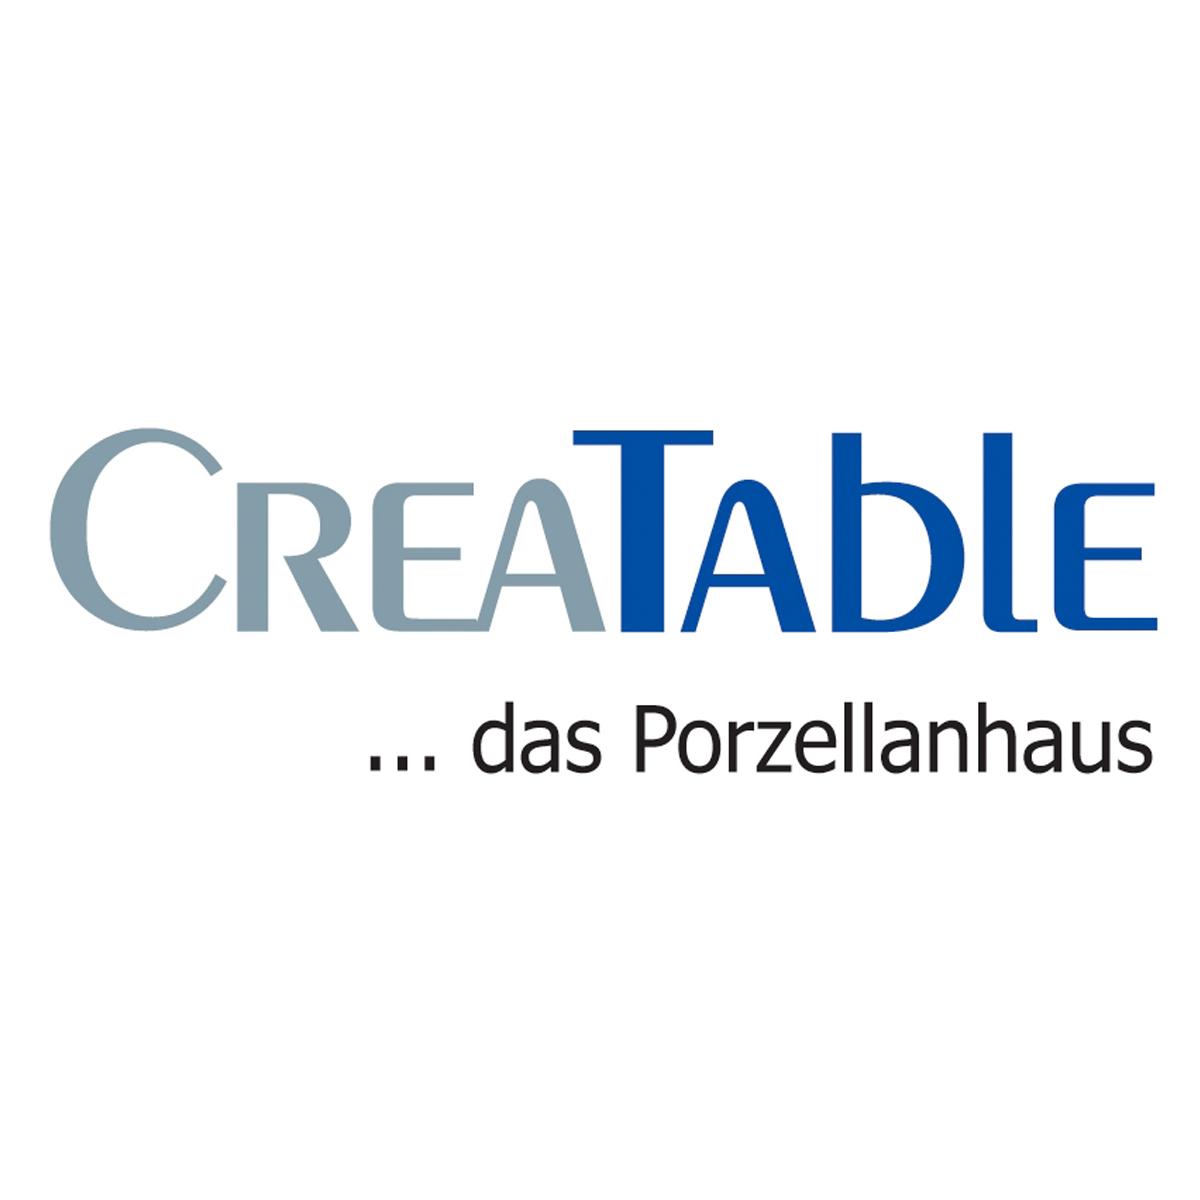 CreaTable